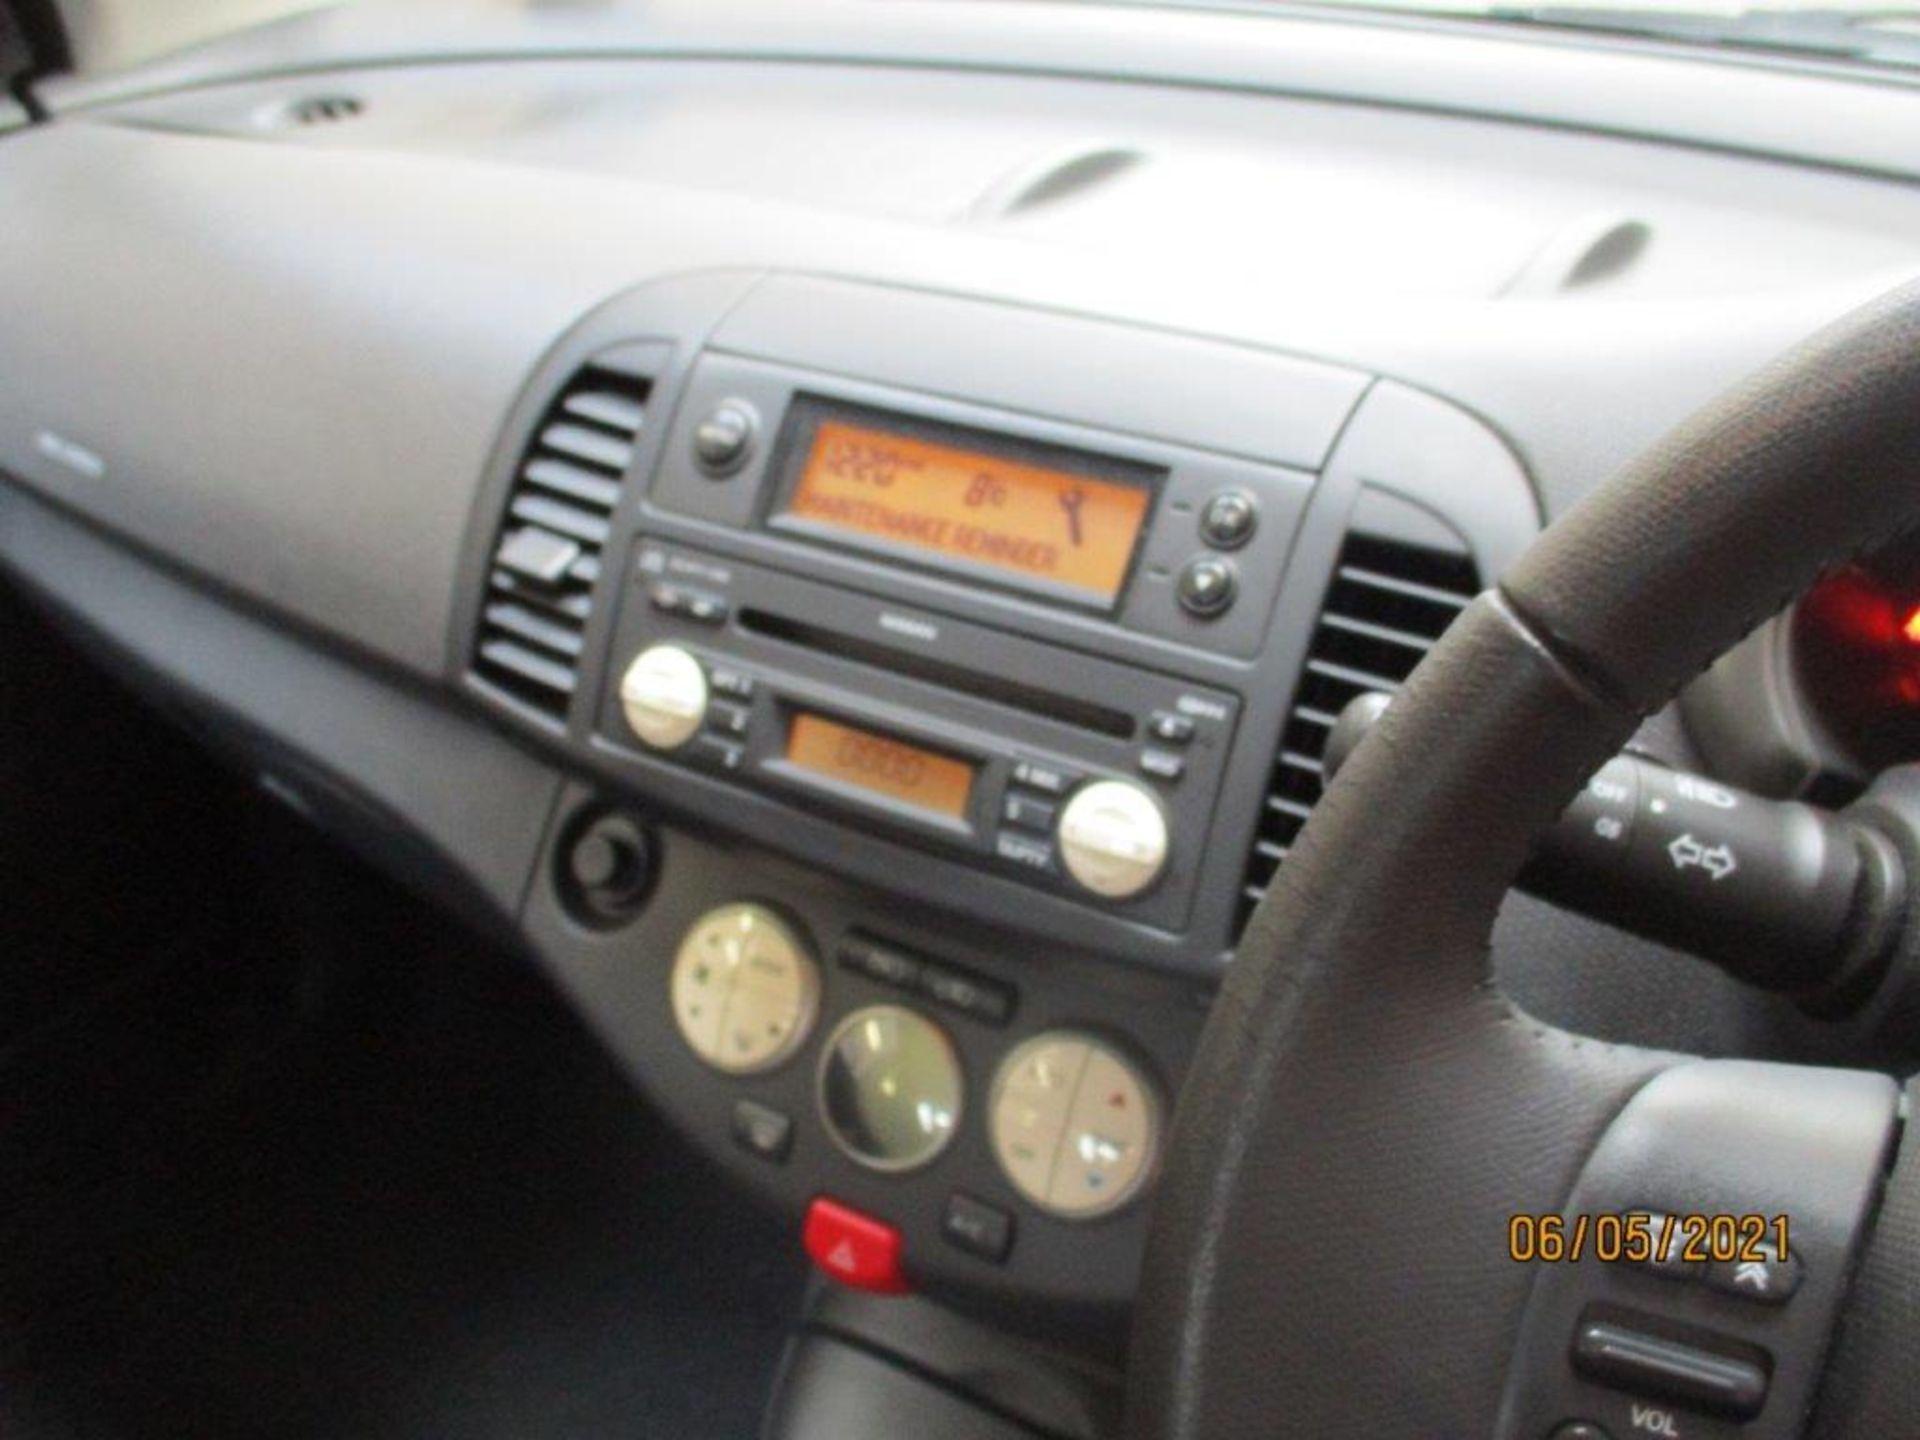 05 05 Nissan Micra SVE - Image 8 of 14